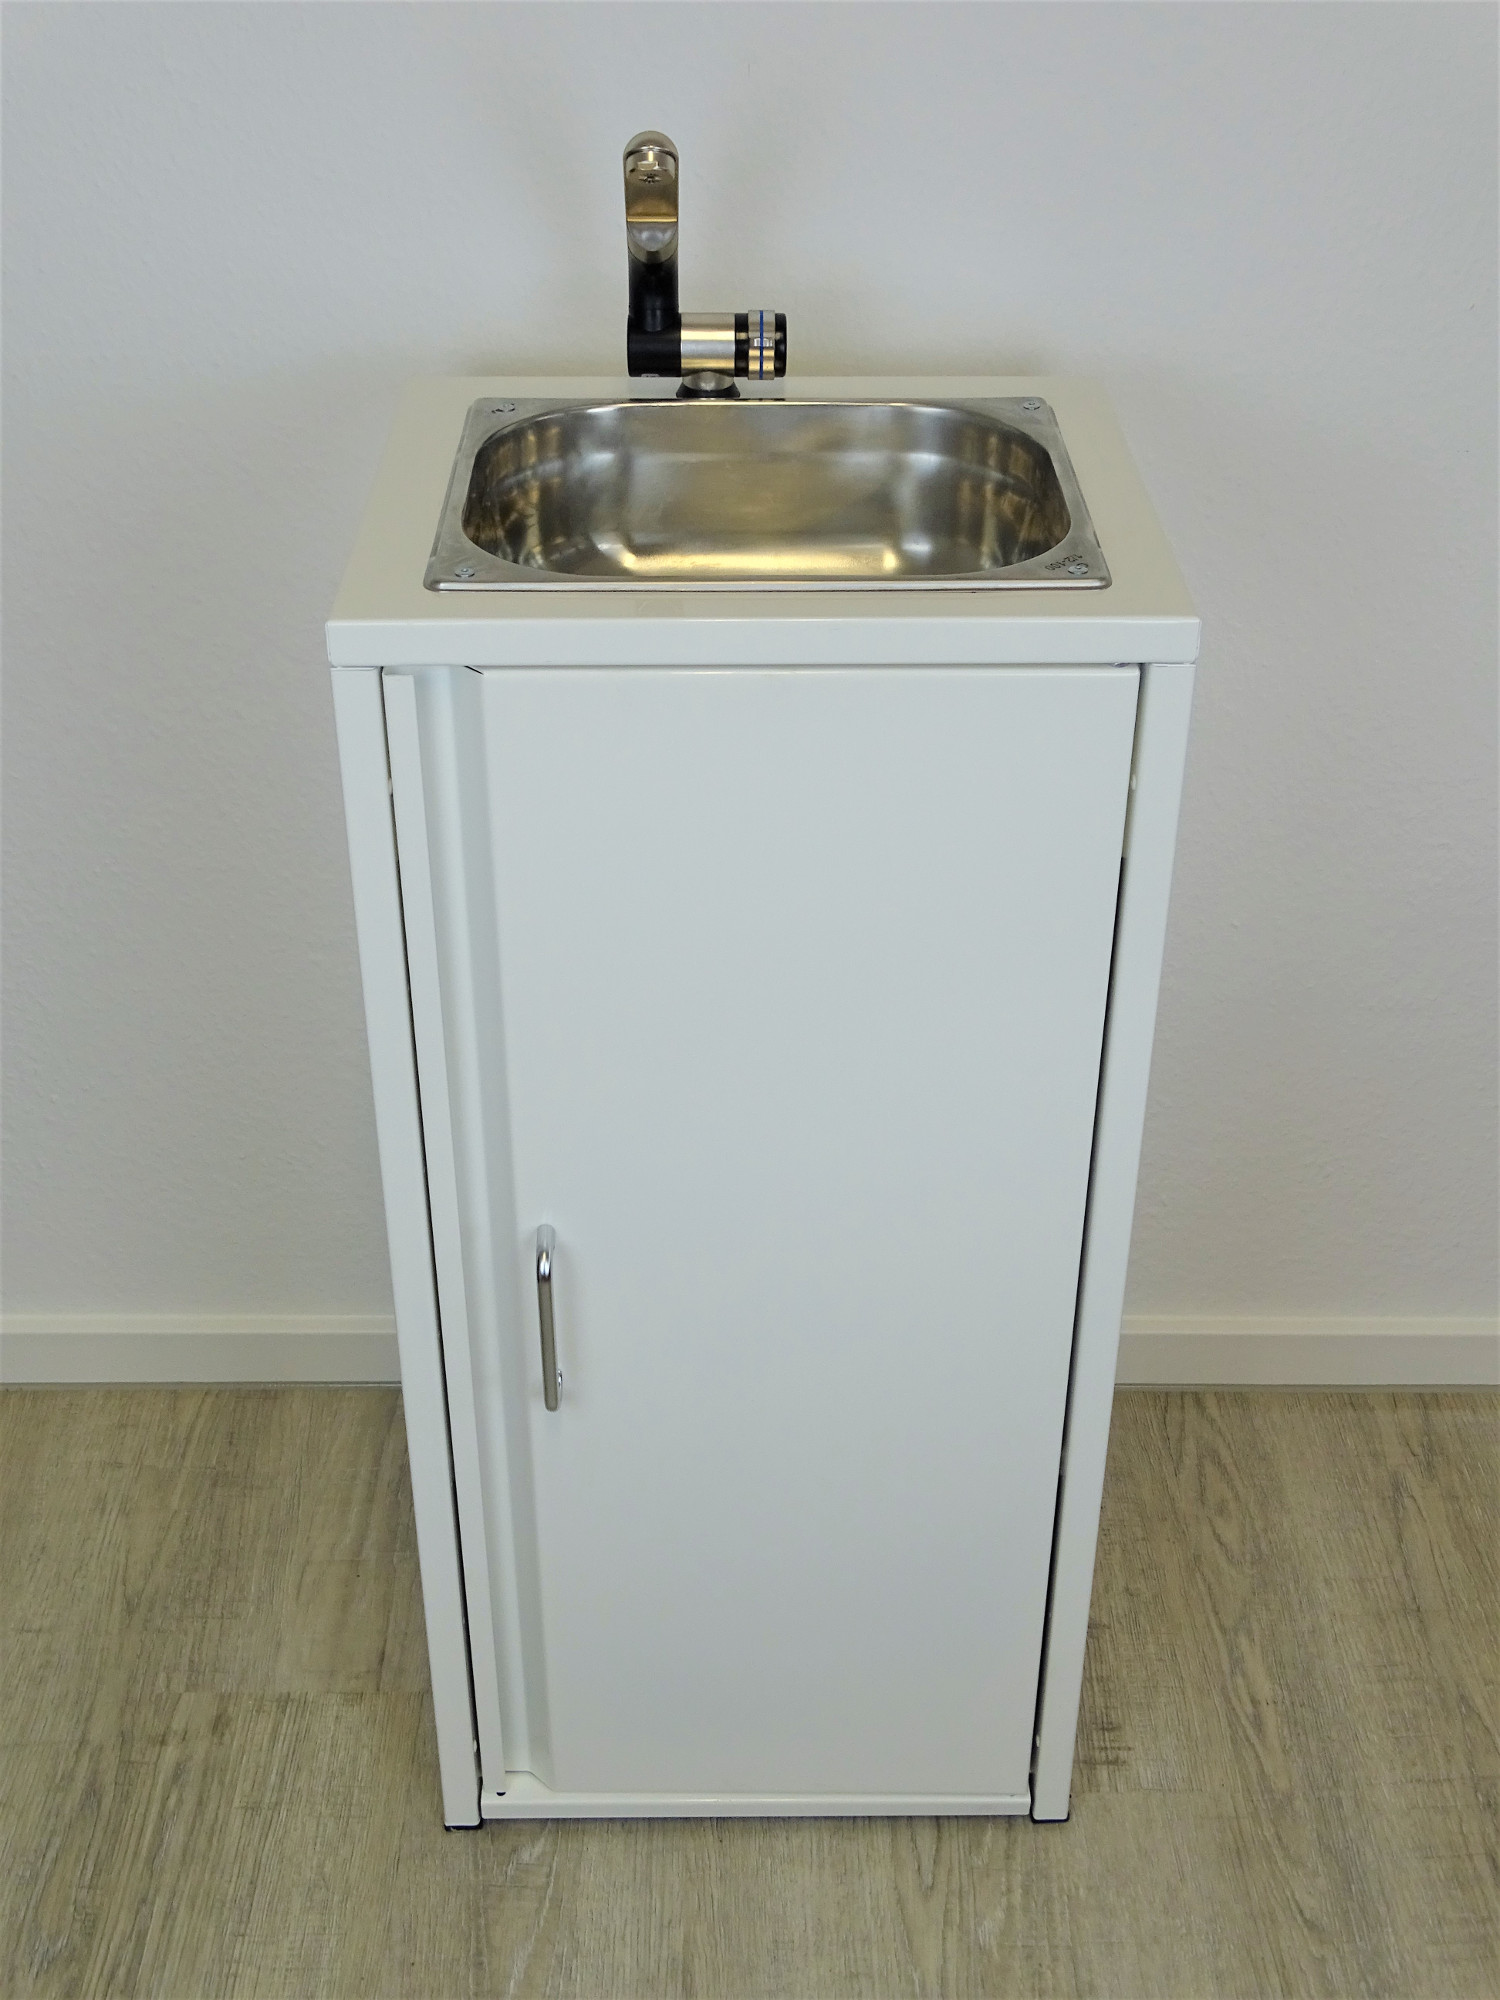 mobiles waschbecken edelstahl sp lbecken handwaschbecken camping outdoor ebay. Black Bedroom Furniture Sets. Home Design Ideas